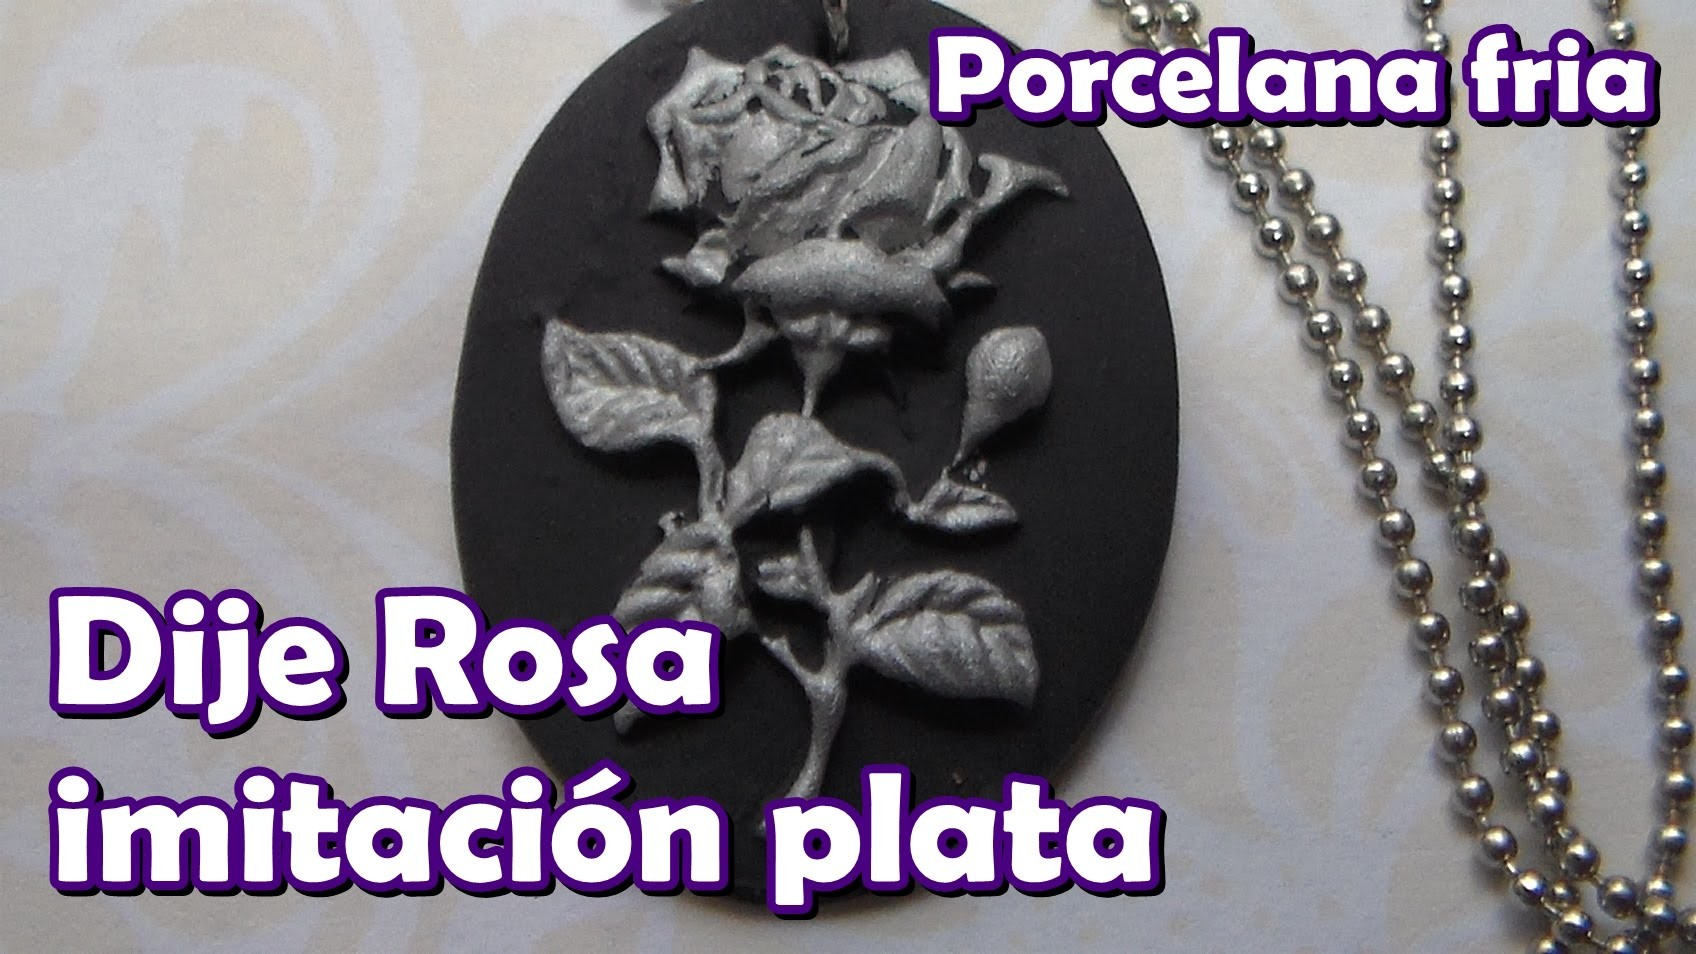 Dije Rosa imitación plata en porcelana fría con molde